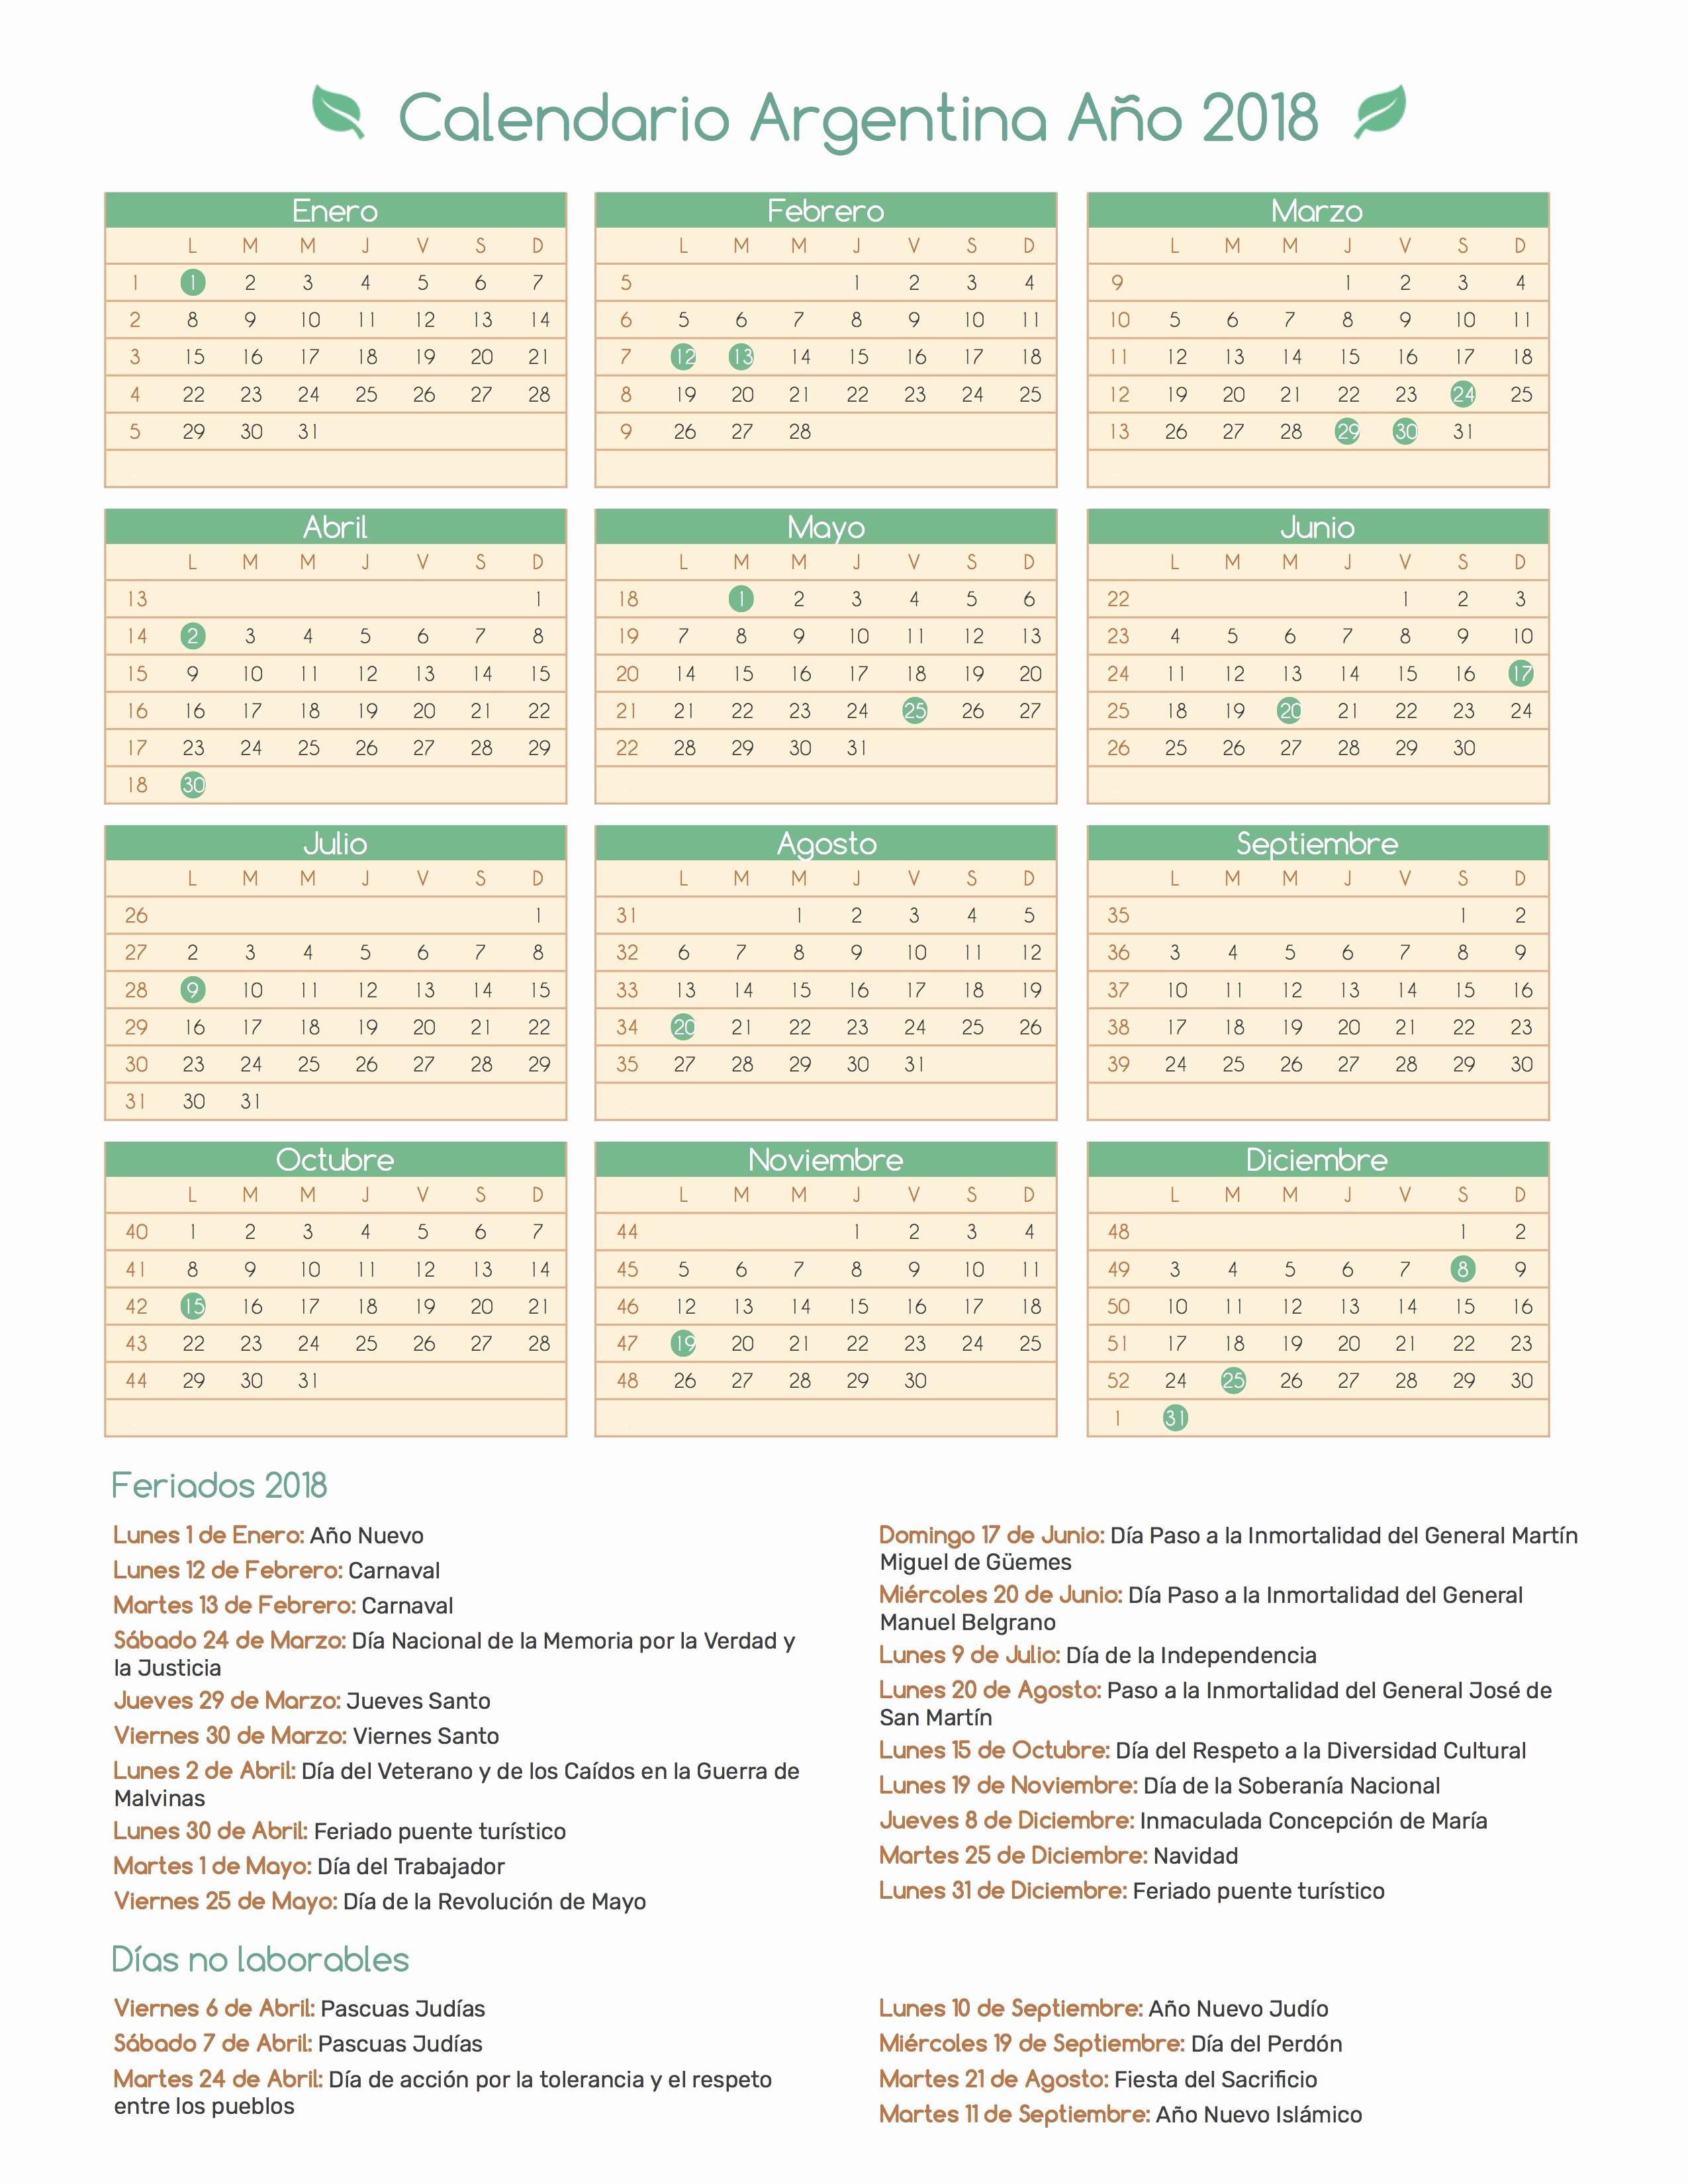 calendario paraguay 2019 calendario paraguay 2019 calendario 2018 con feriados para imprimir argentina